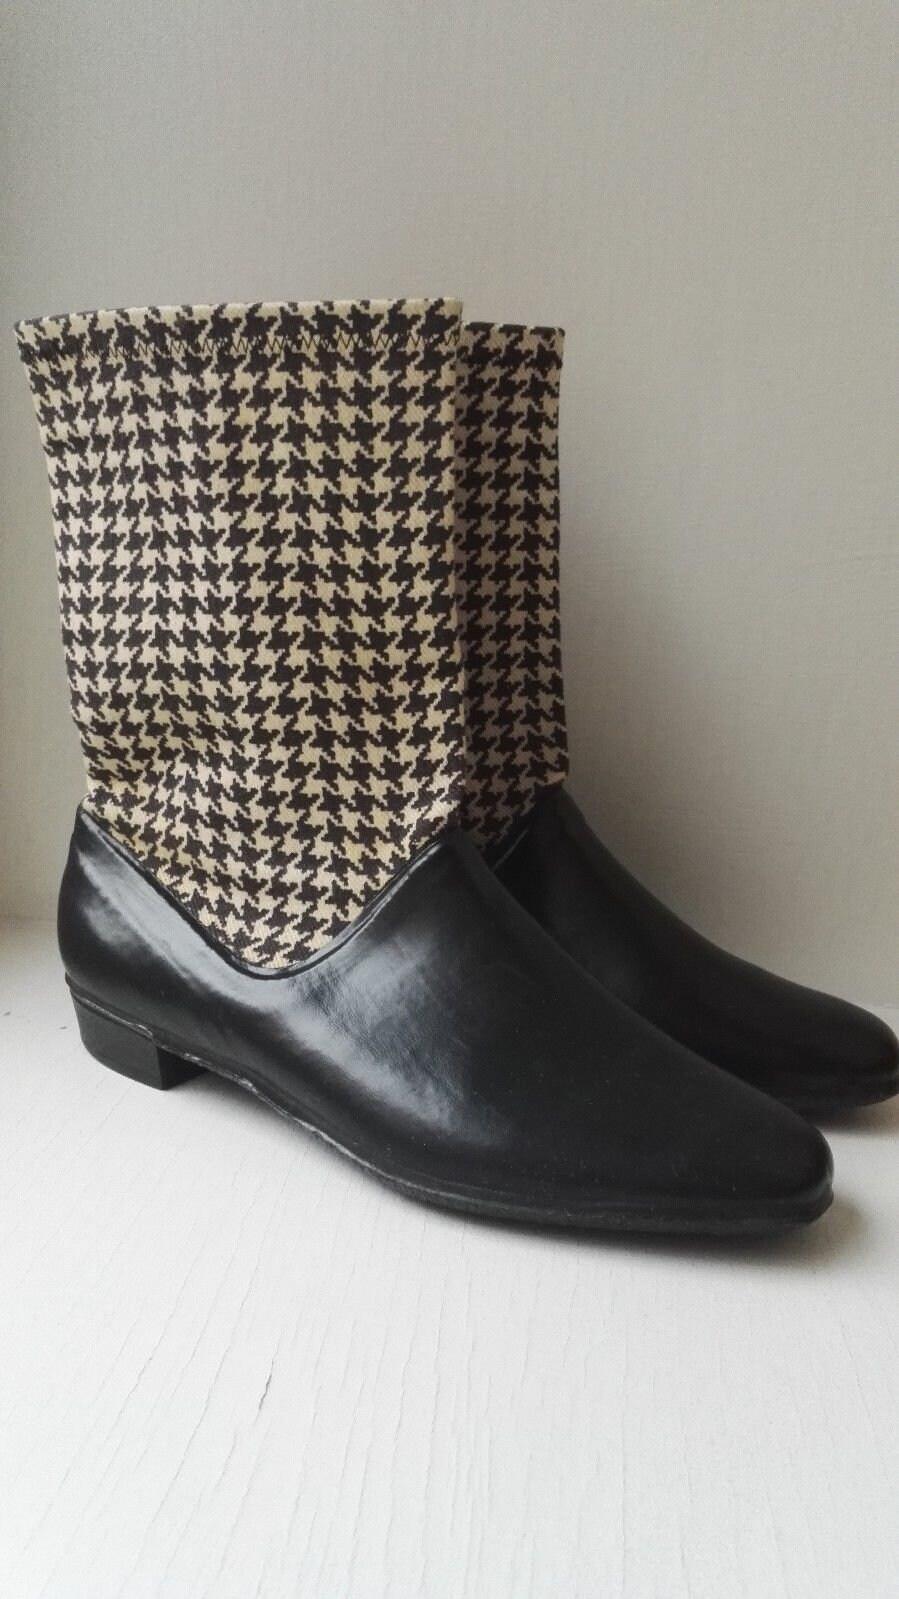 60s Vintage Tretorn Rain Rubber Boots Black White Fabric